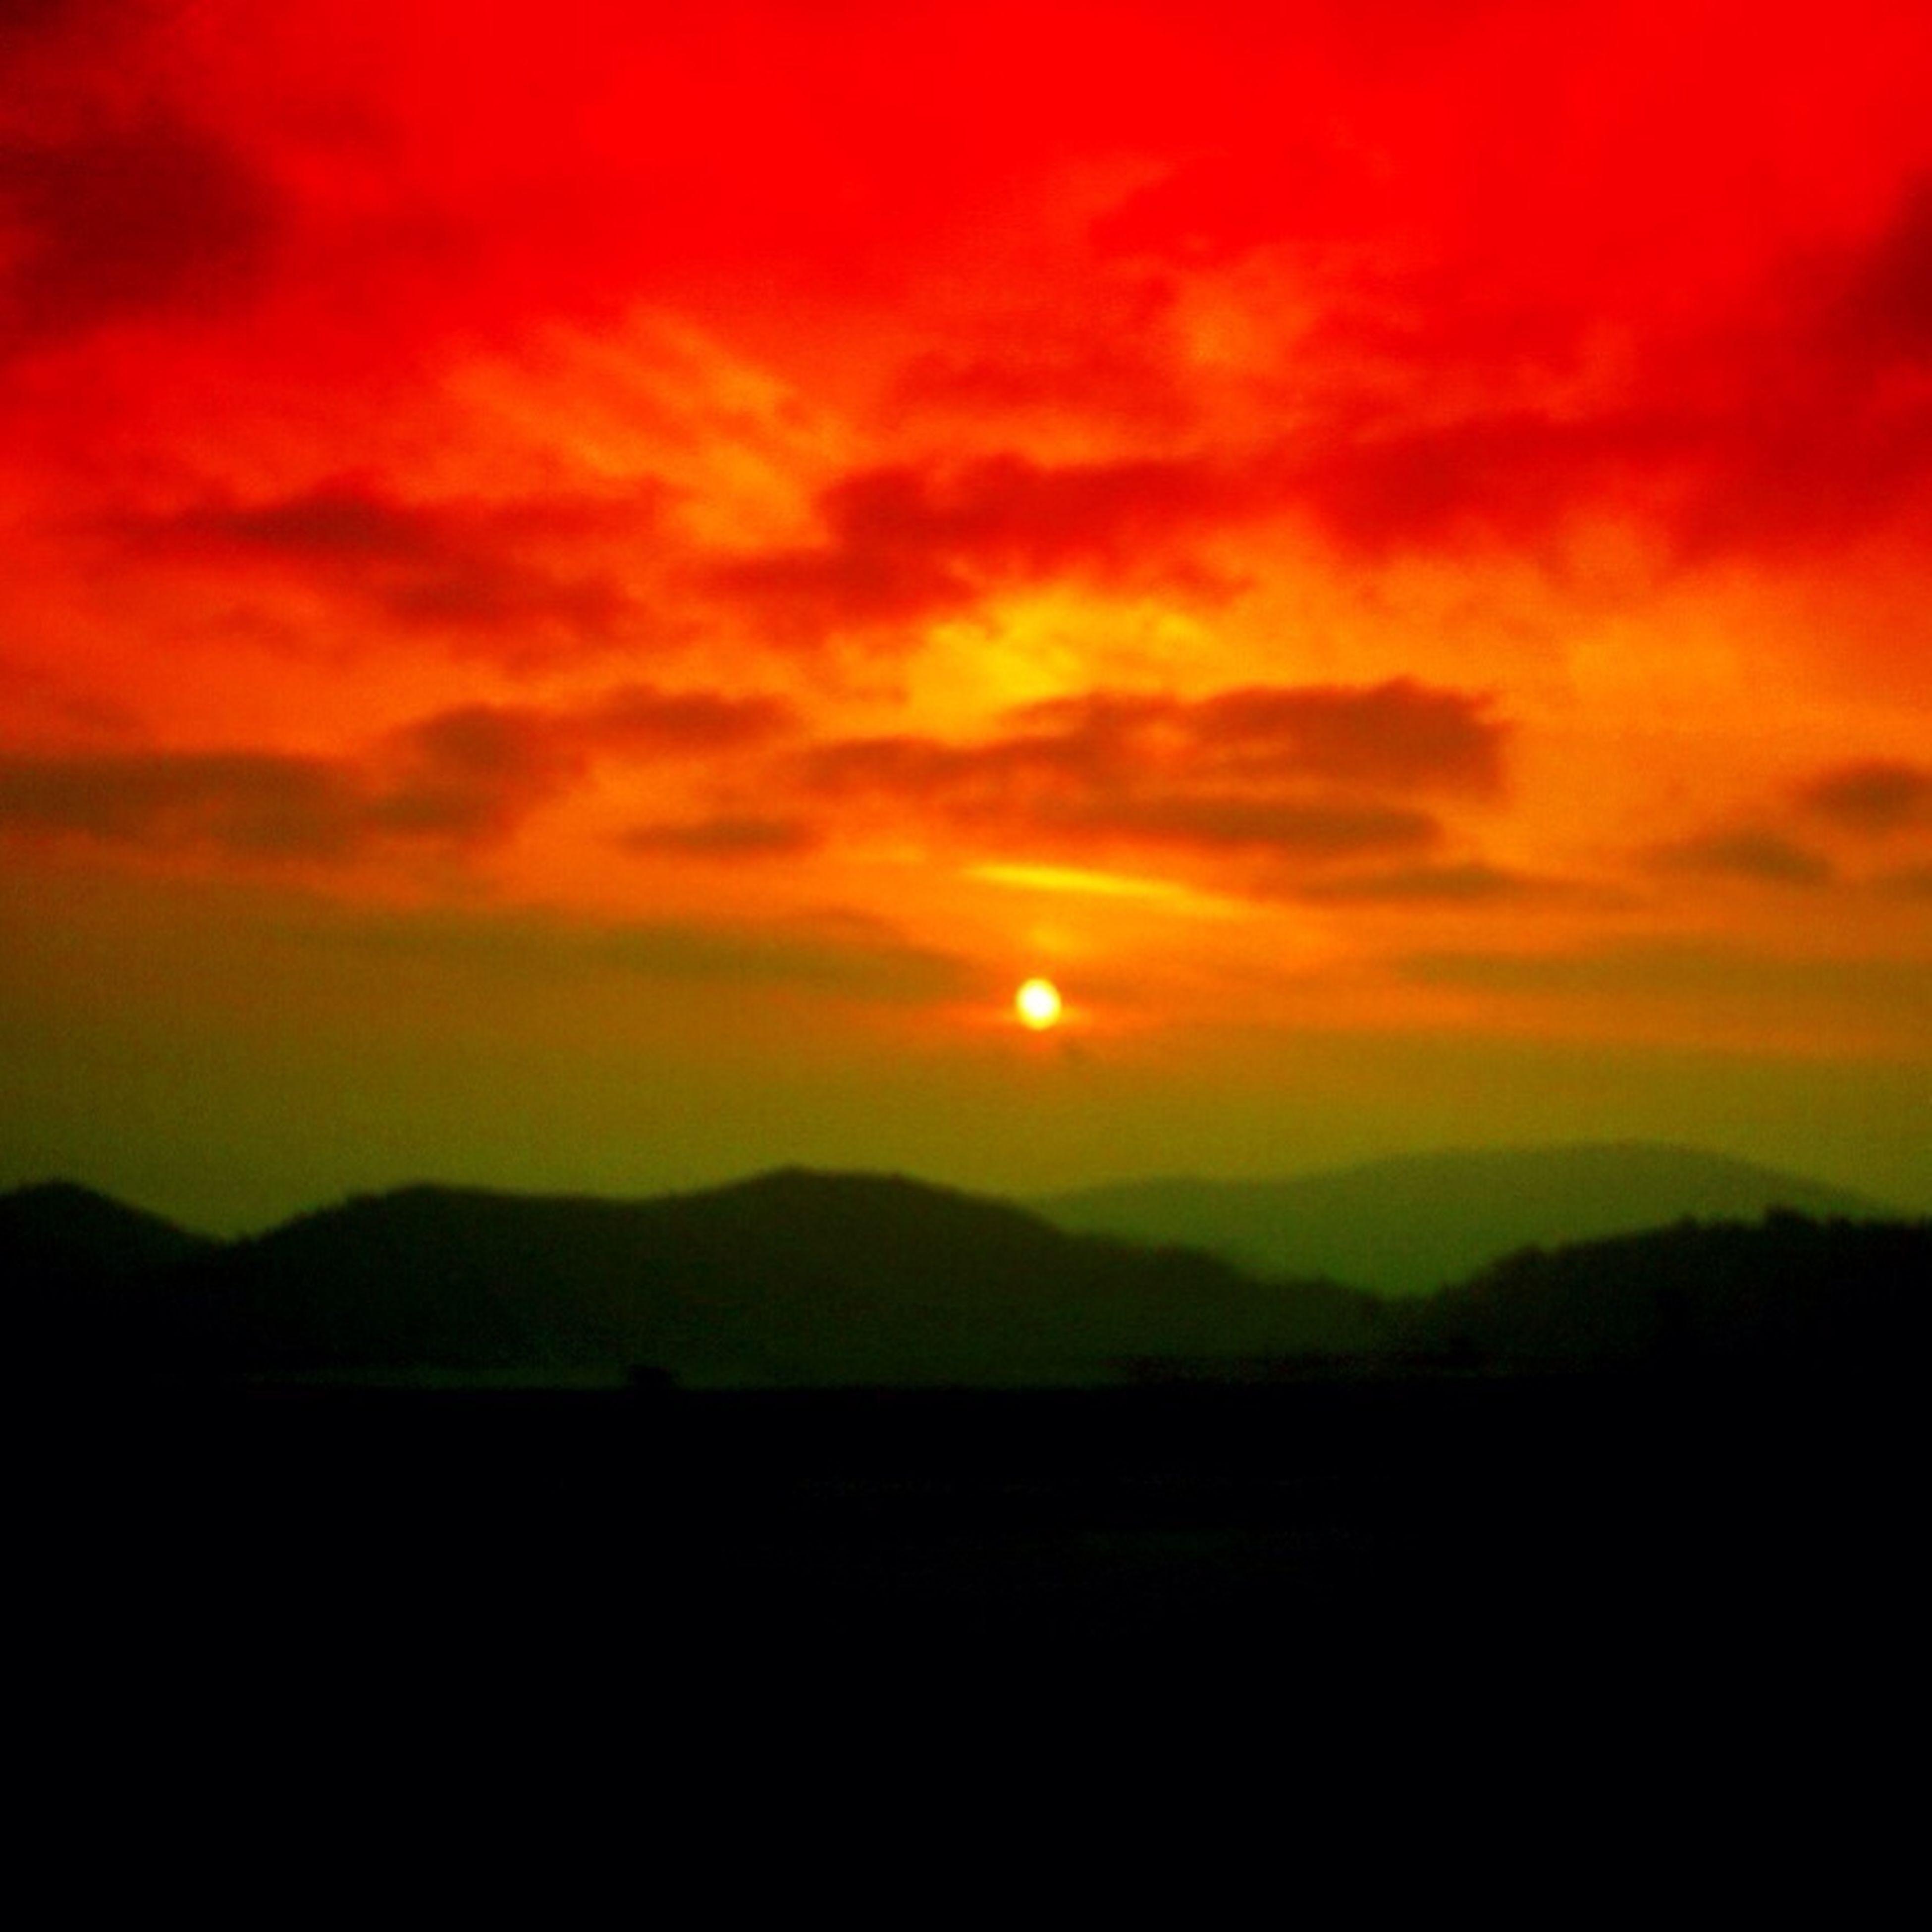 Clouds Sun Sunset Sky Trees Enjoying The Sun Hello World Gang_family Ee_daily